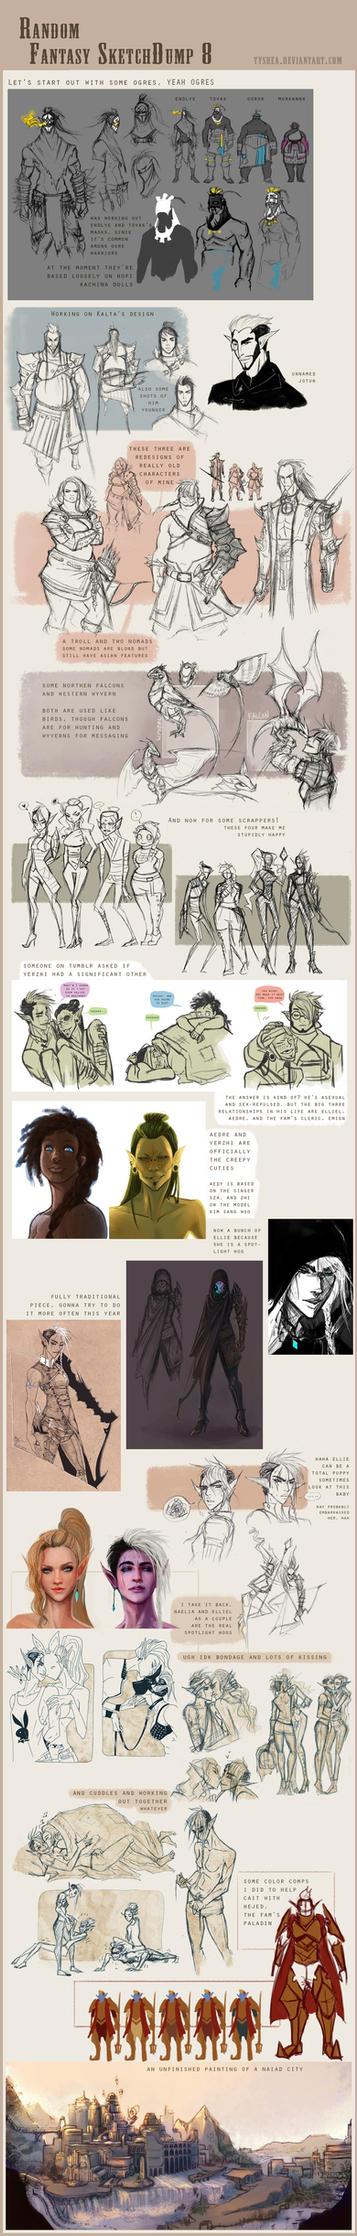 Fantasy Sketchdump 8 by Dyemelikeasunset